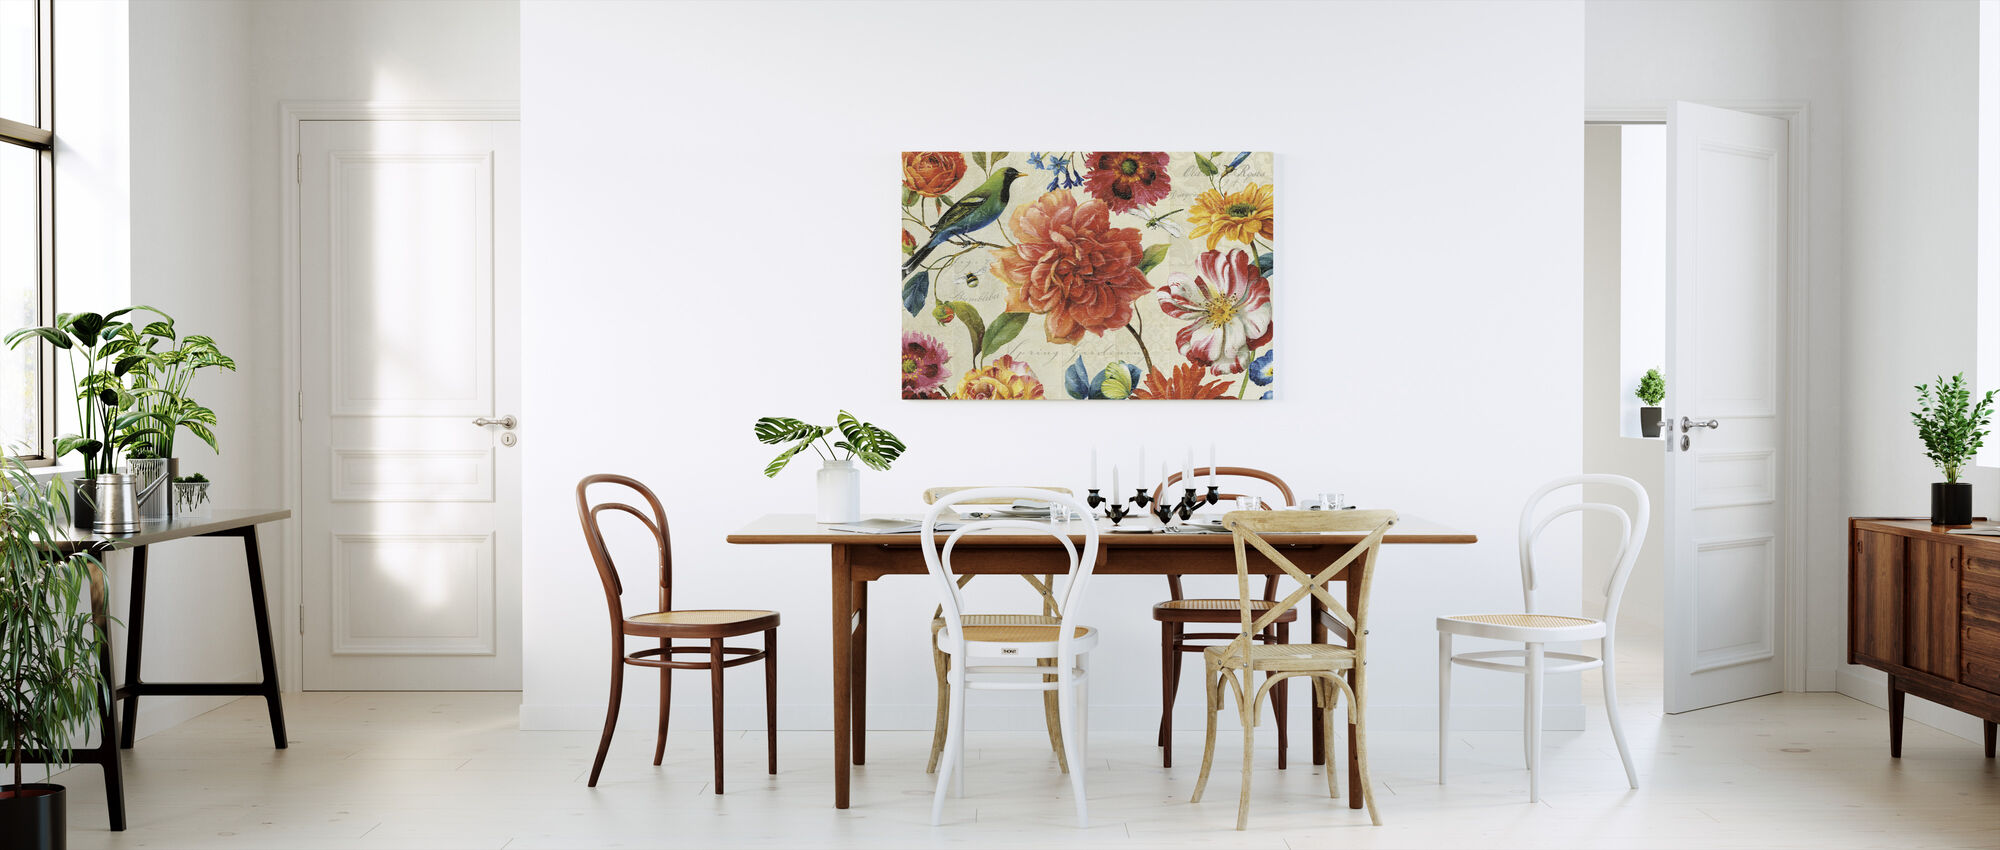 Regenboog Tuin Crème - Canvas print - Keuken